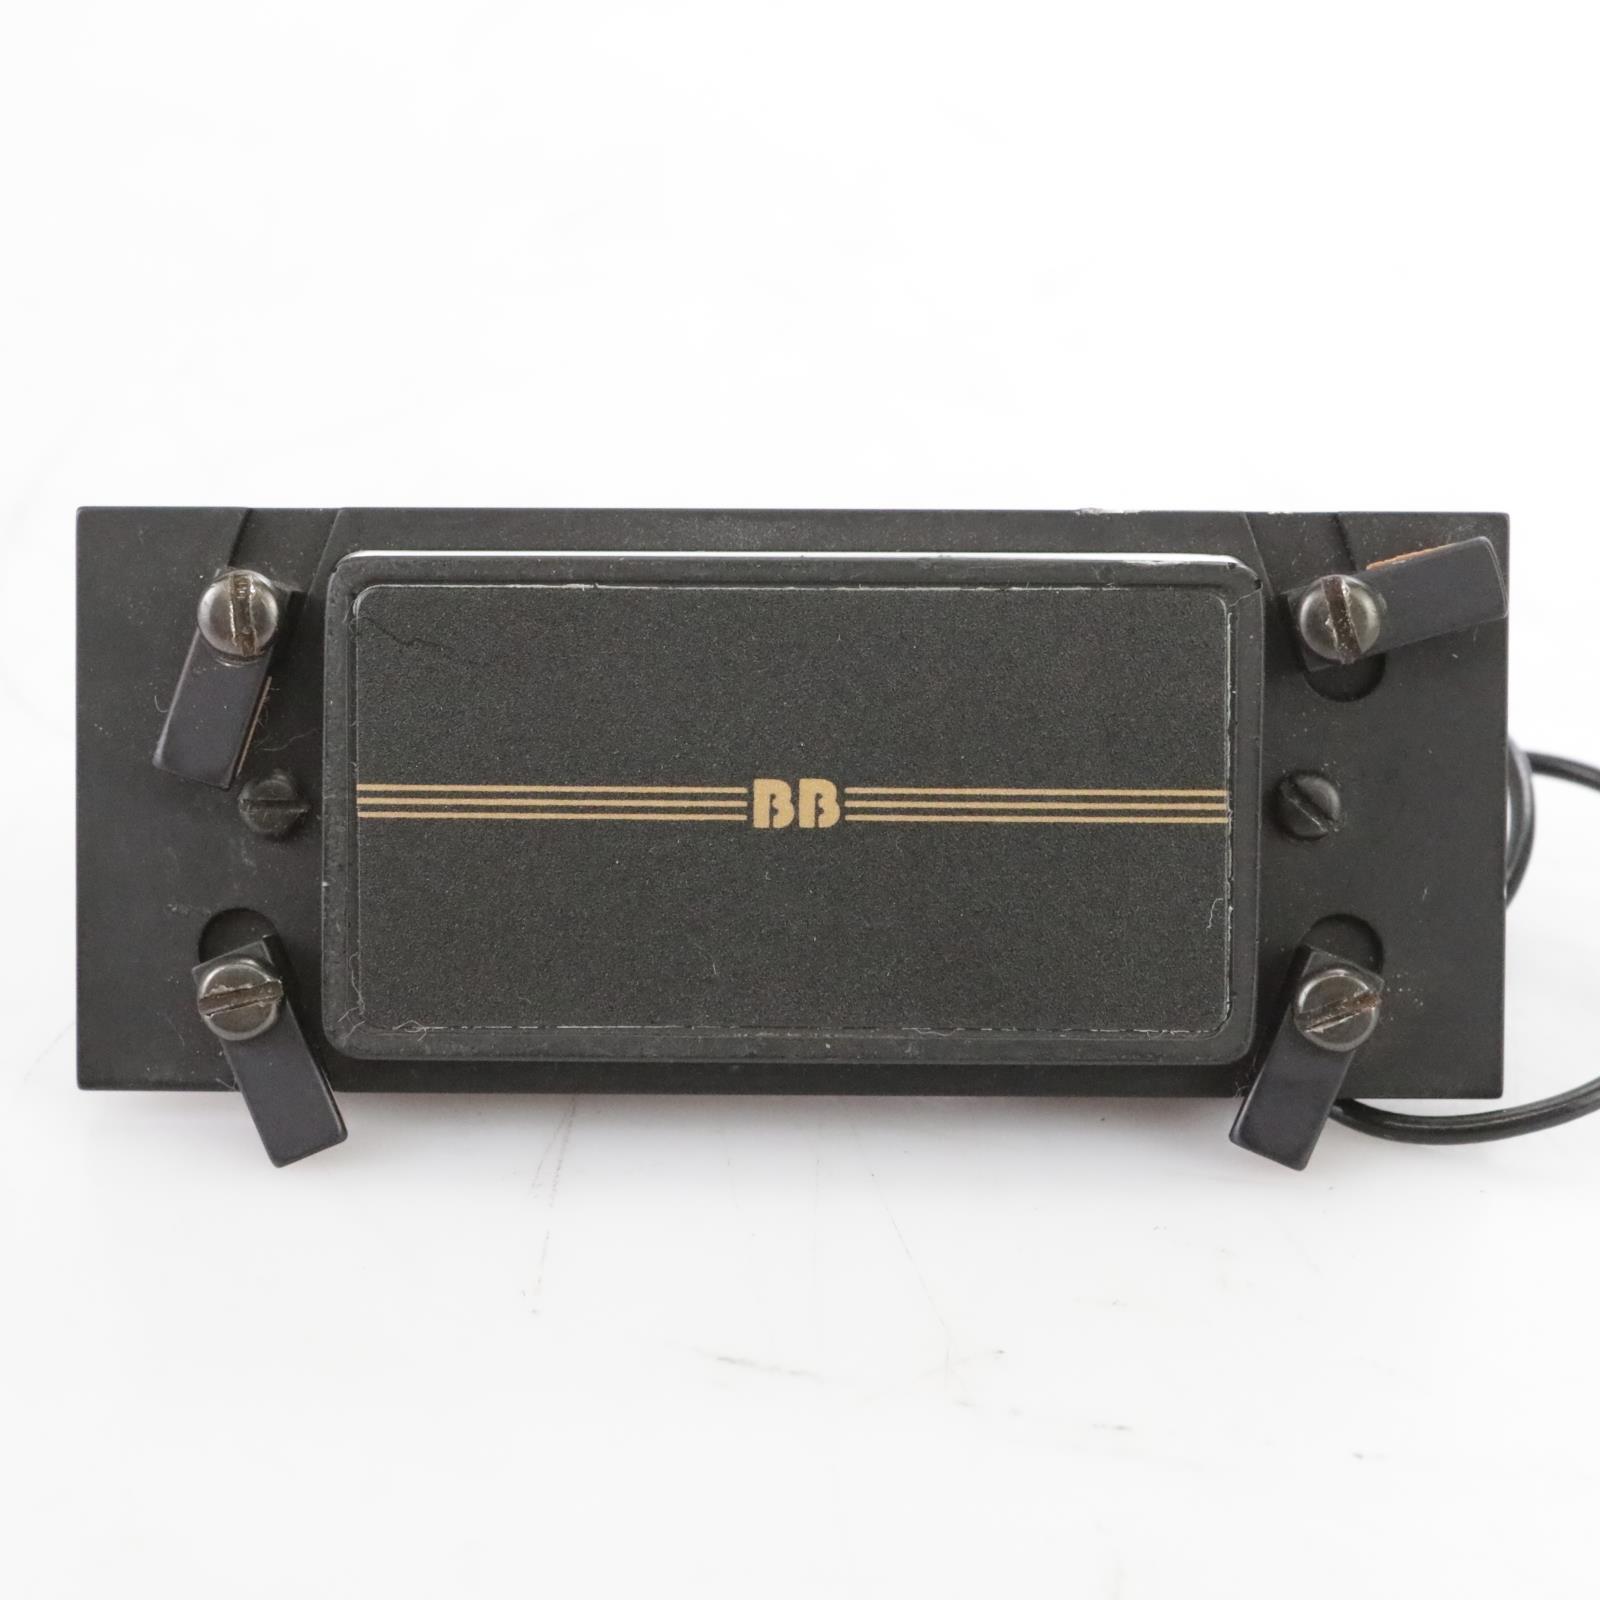 Barcus-Berry Hi-Tek Electric Humbucker Pickup Owned By David Roback #44696